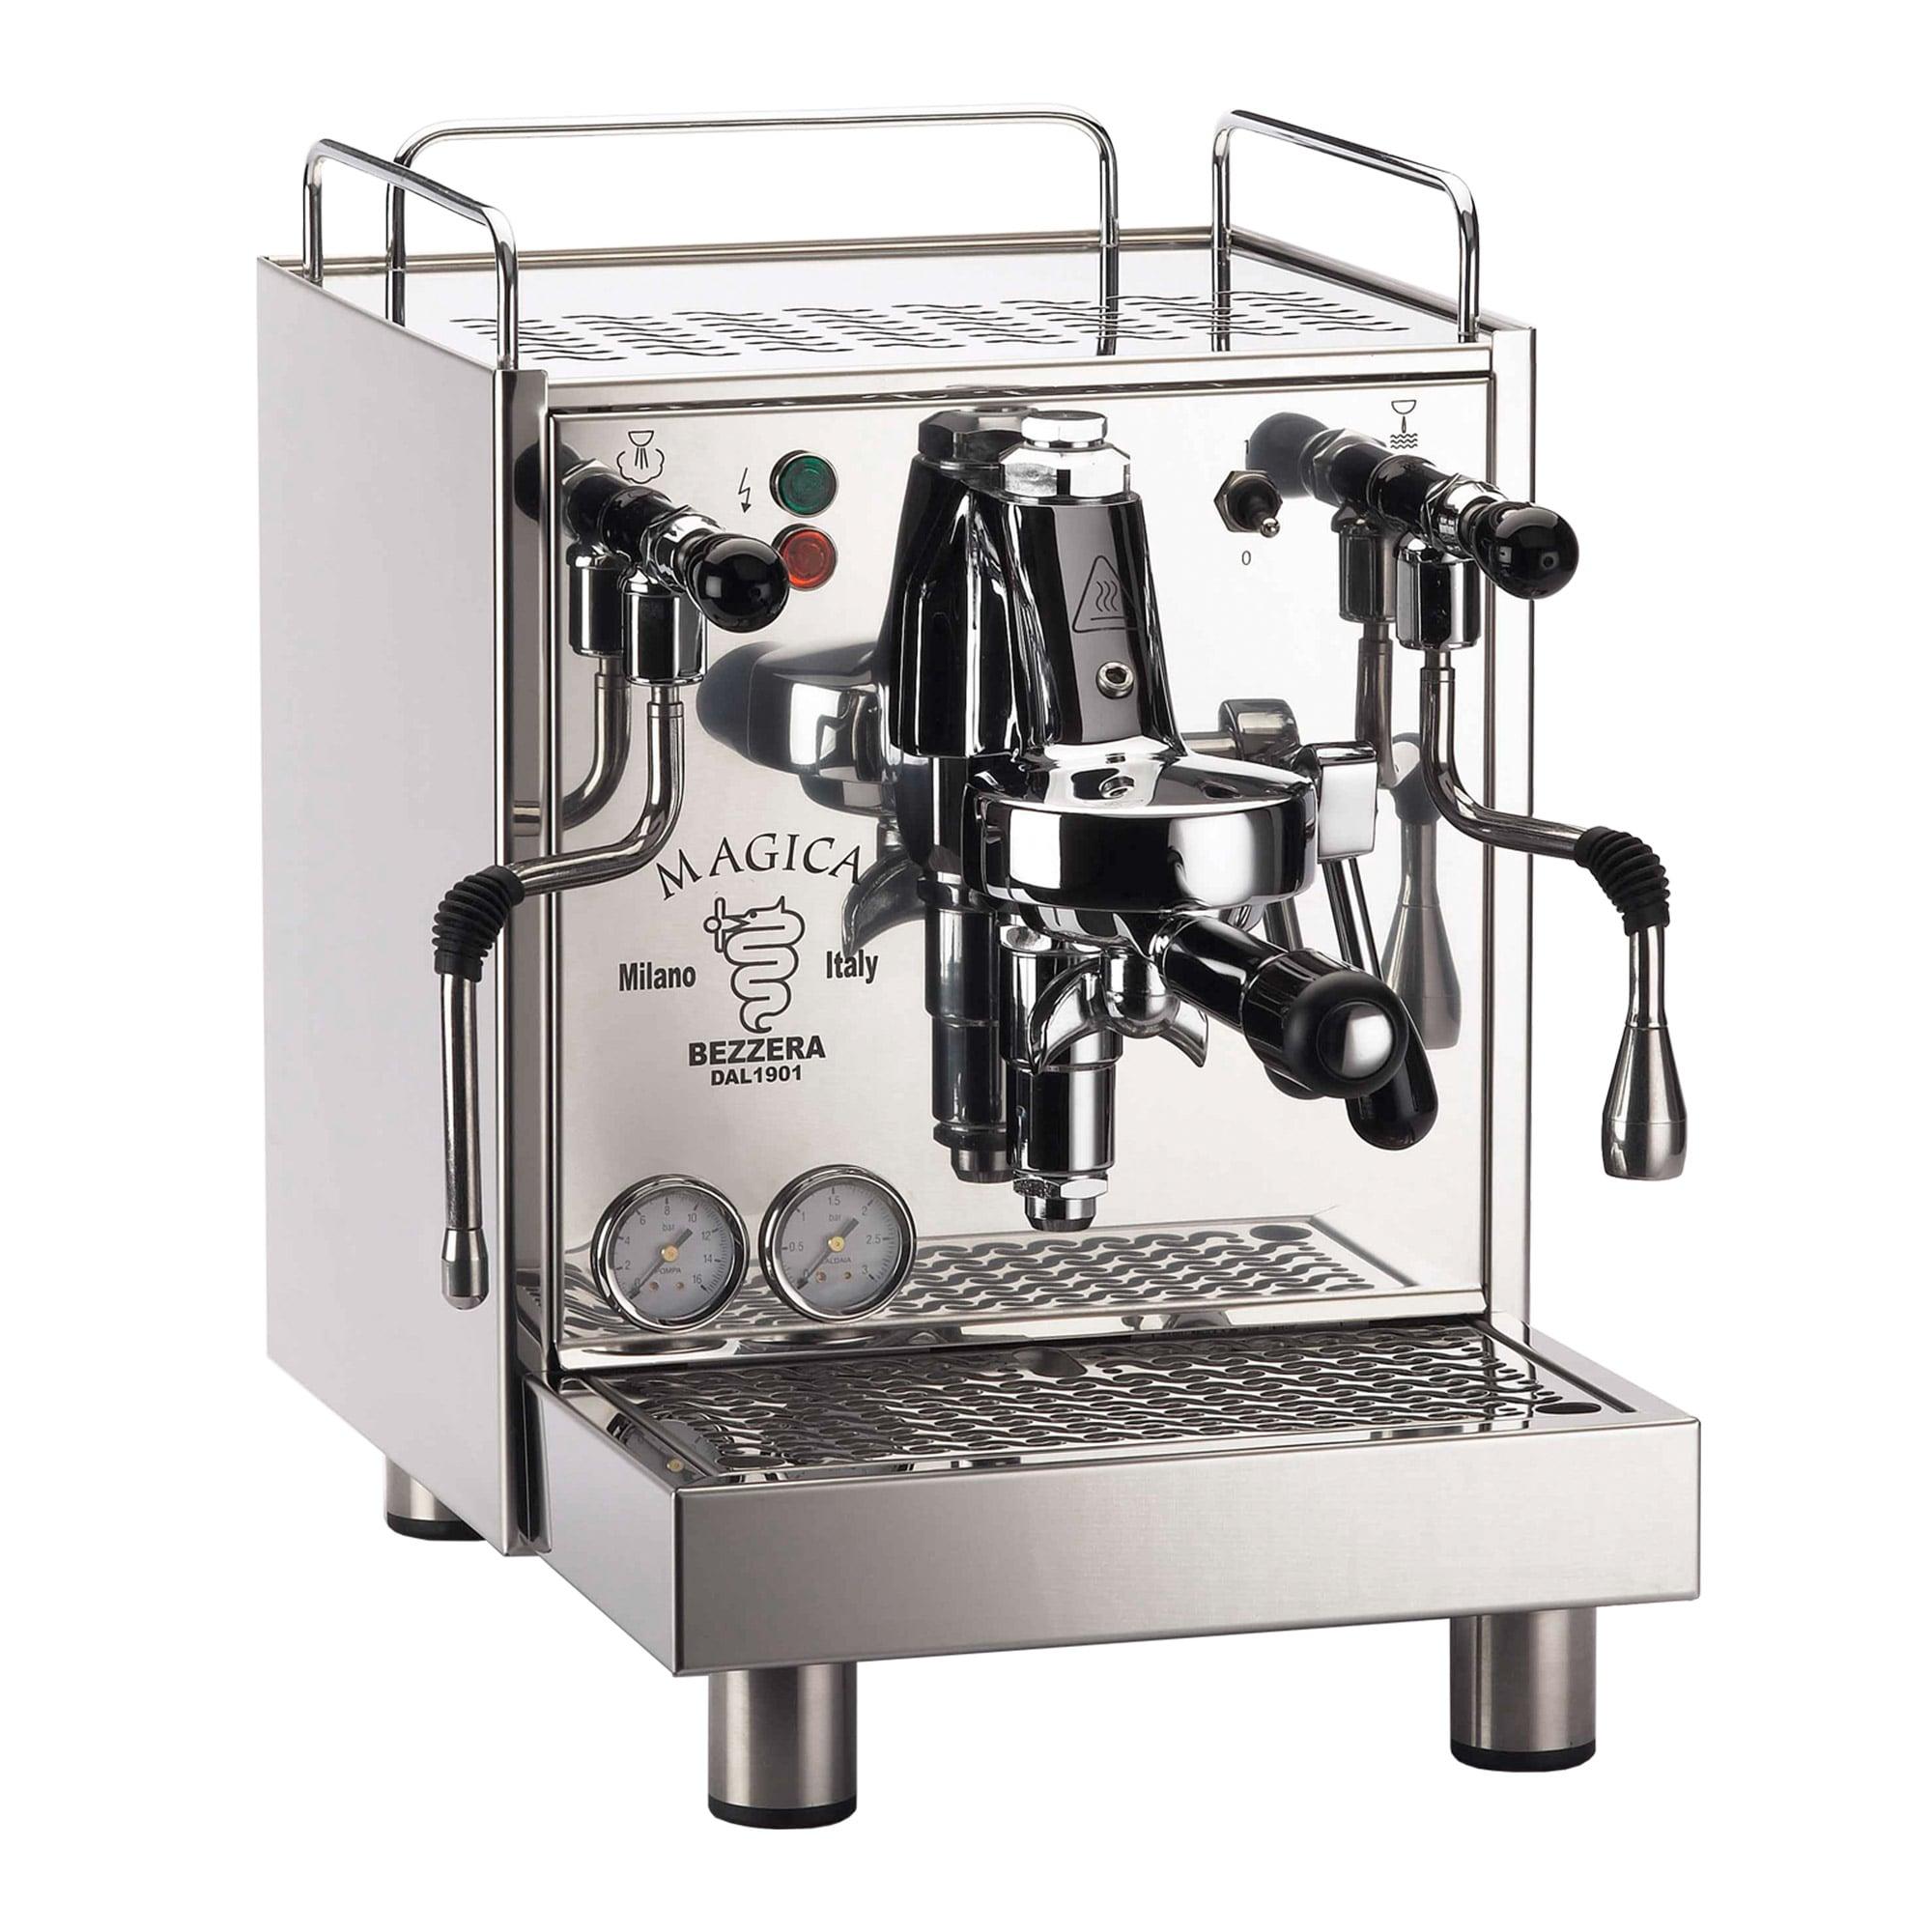 bezzera magica s espressomaschine online kaufen coffee circle. Black Bedroom Furniture Sets. Home Design Ideas